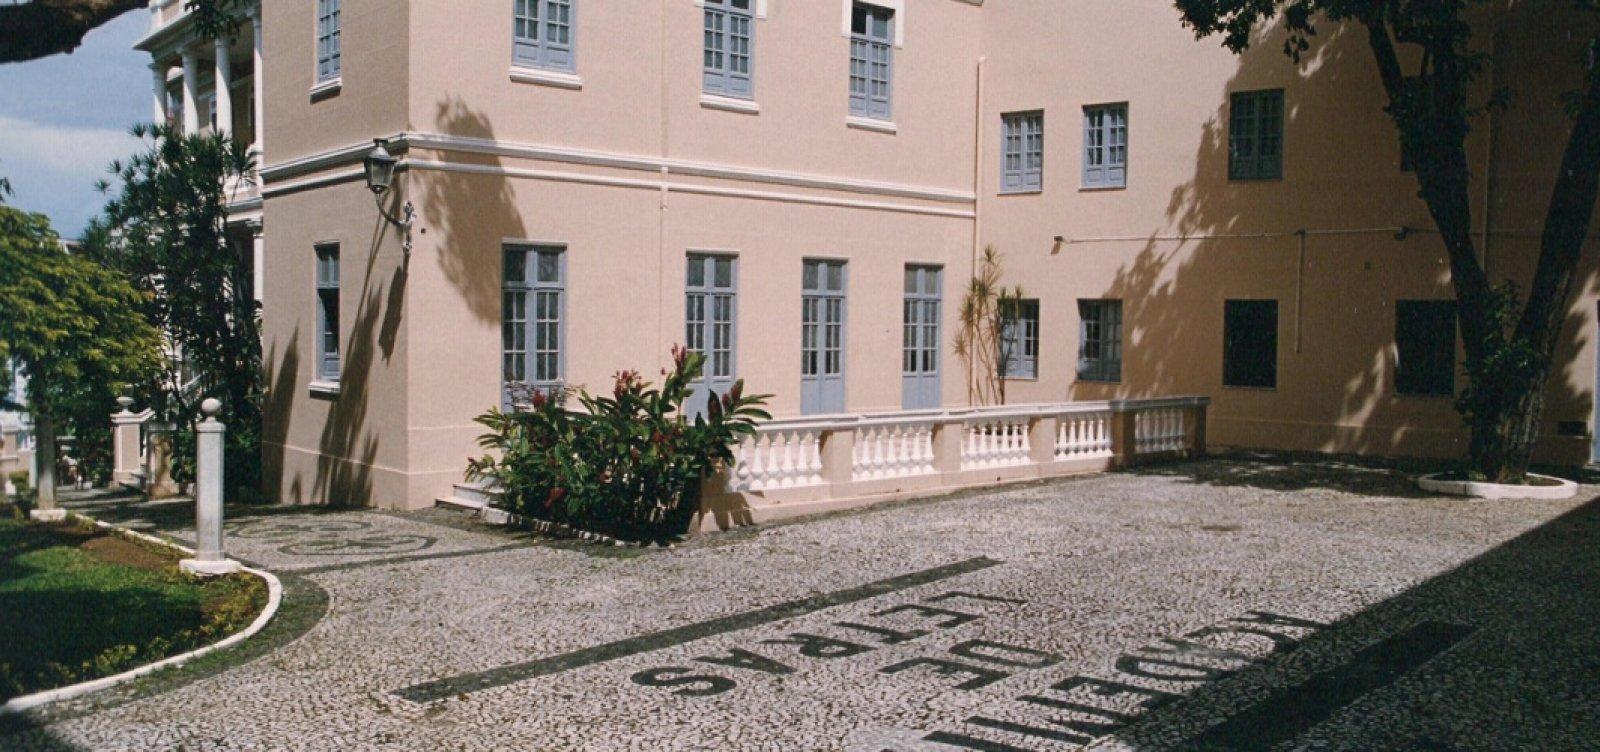 Academia de Letras da Bahia emite carta aberta a candidatos ao governo